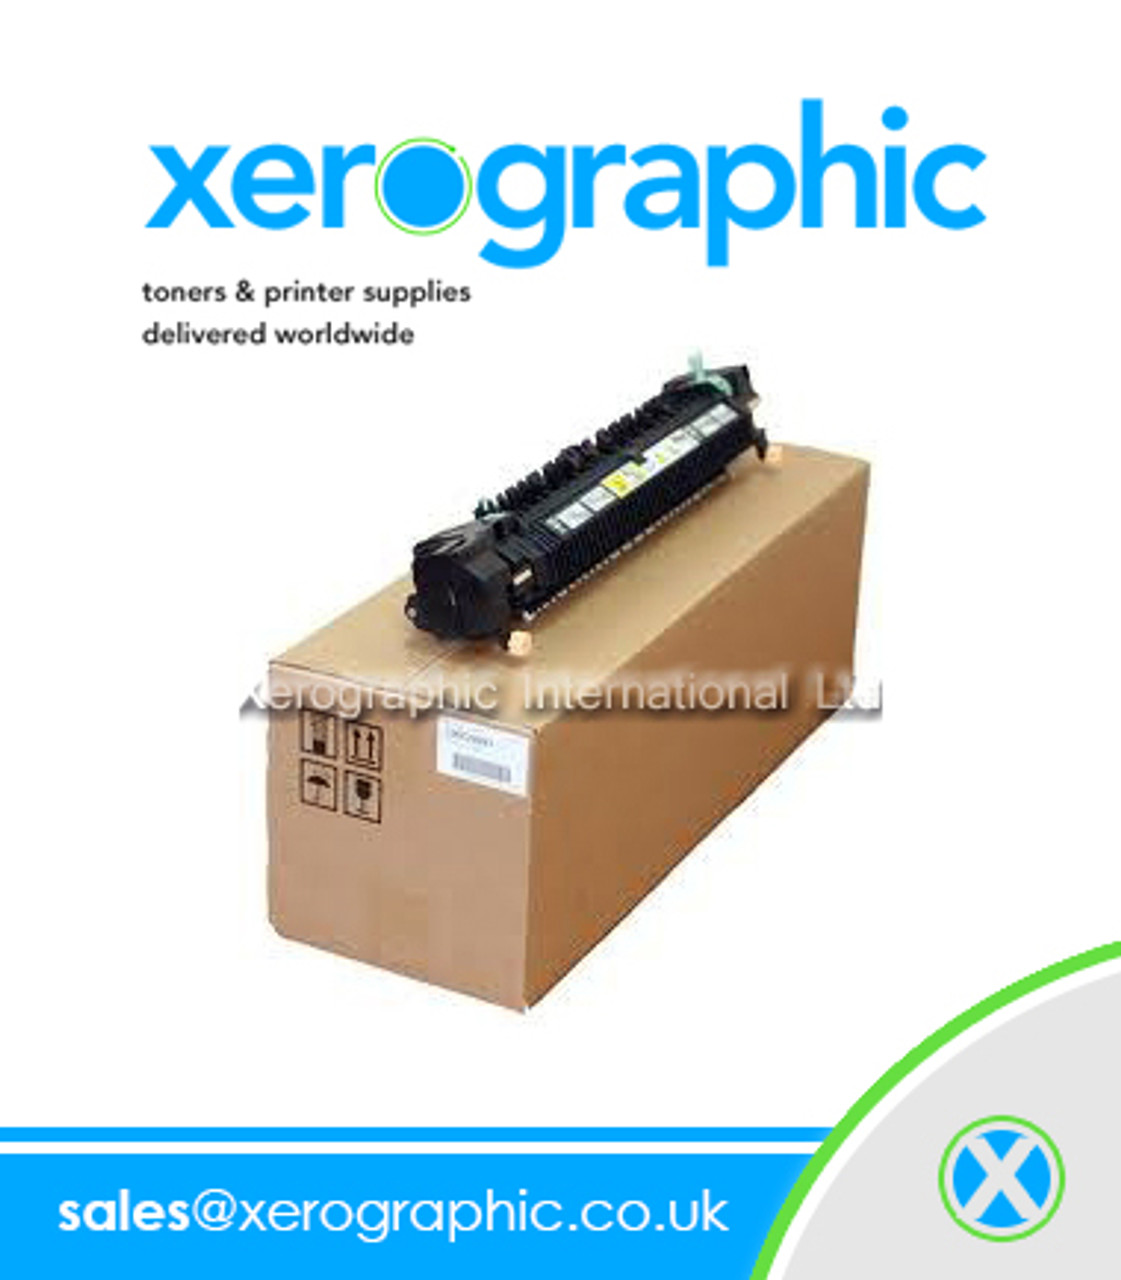 Xerox WorkCentre 7525 7530 7535 7830 7835 Genuine 220V Low Speed Fuser  Cartridge 604K62220, 641S00809, JP-126K34371, JP-126K28293, JP-126K28295